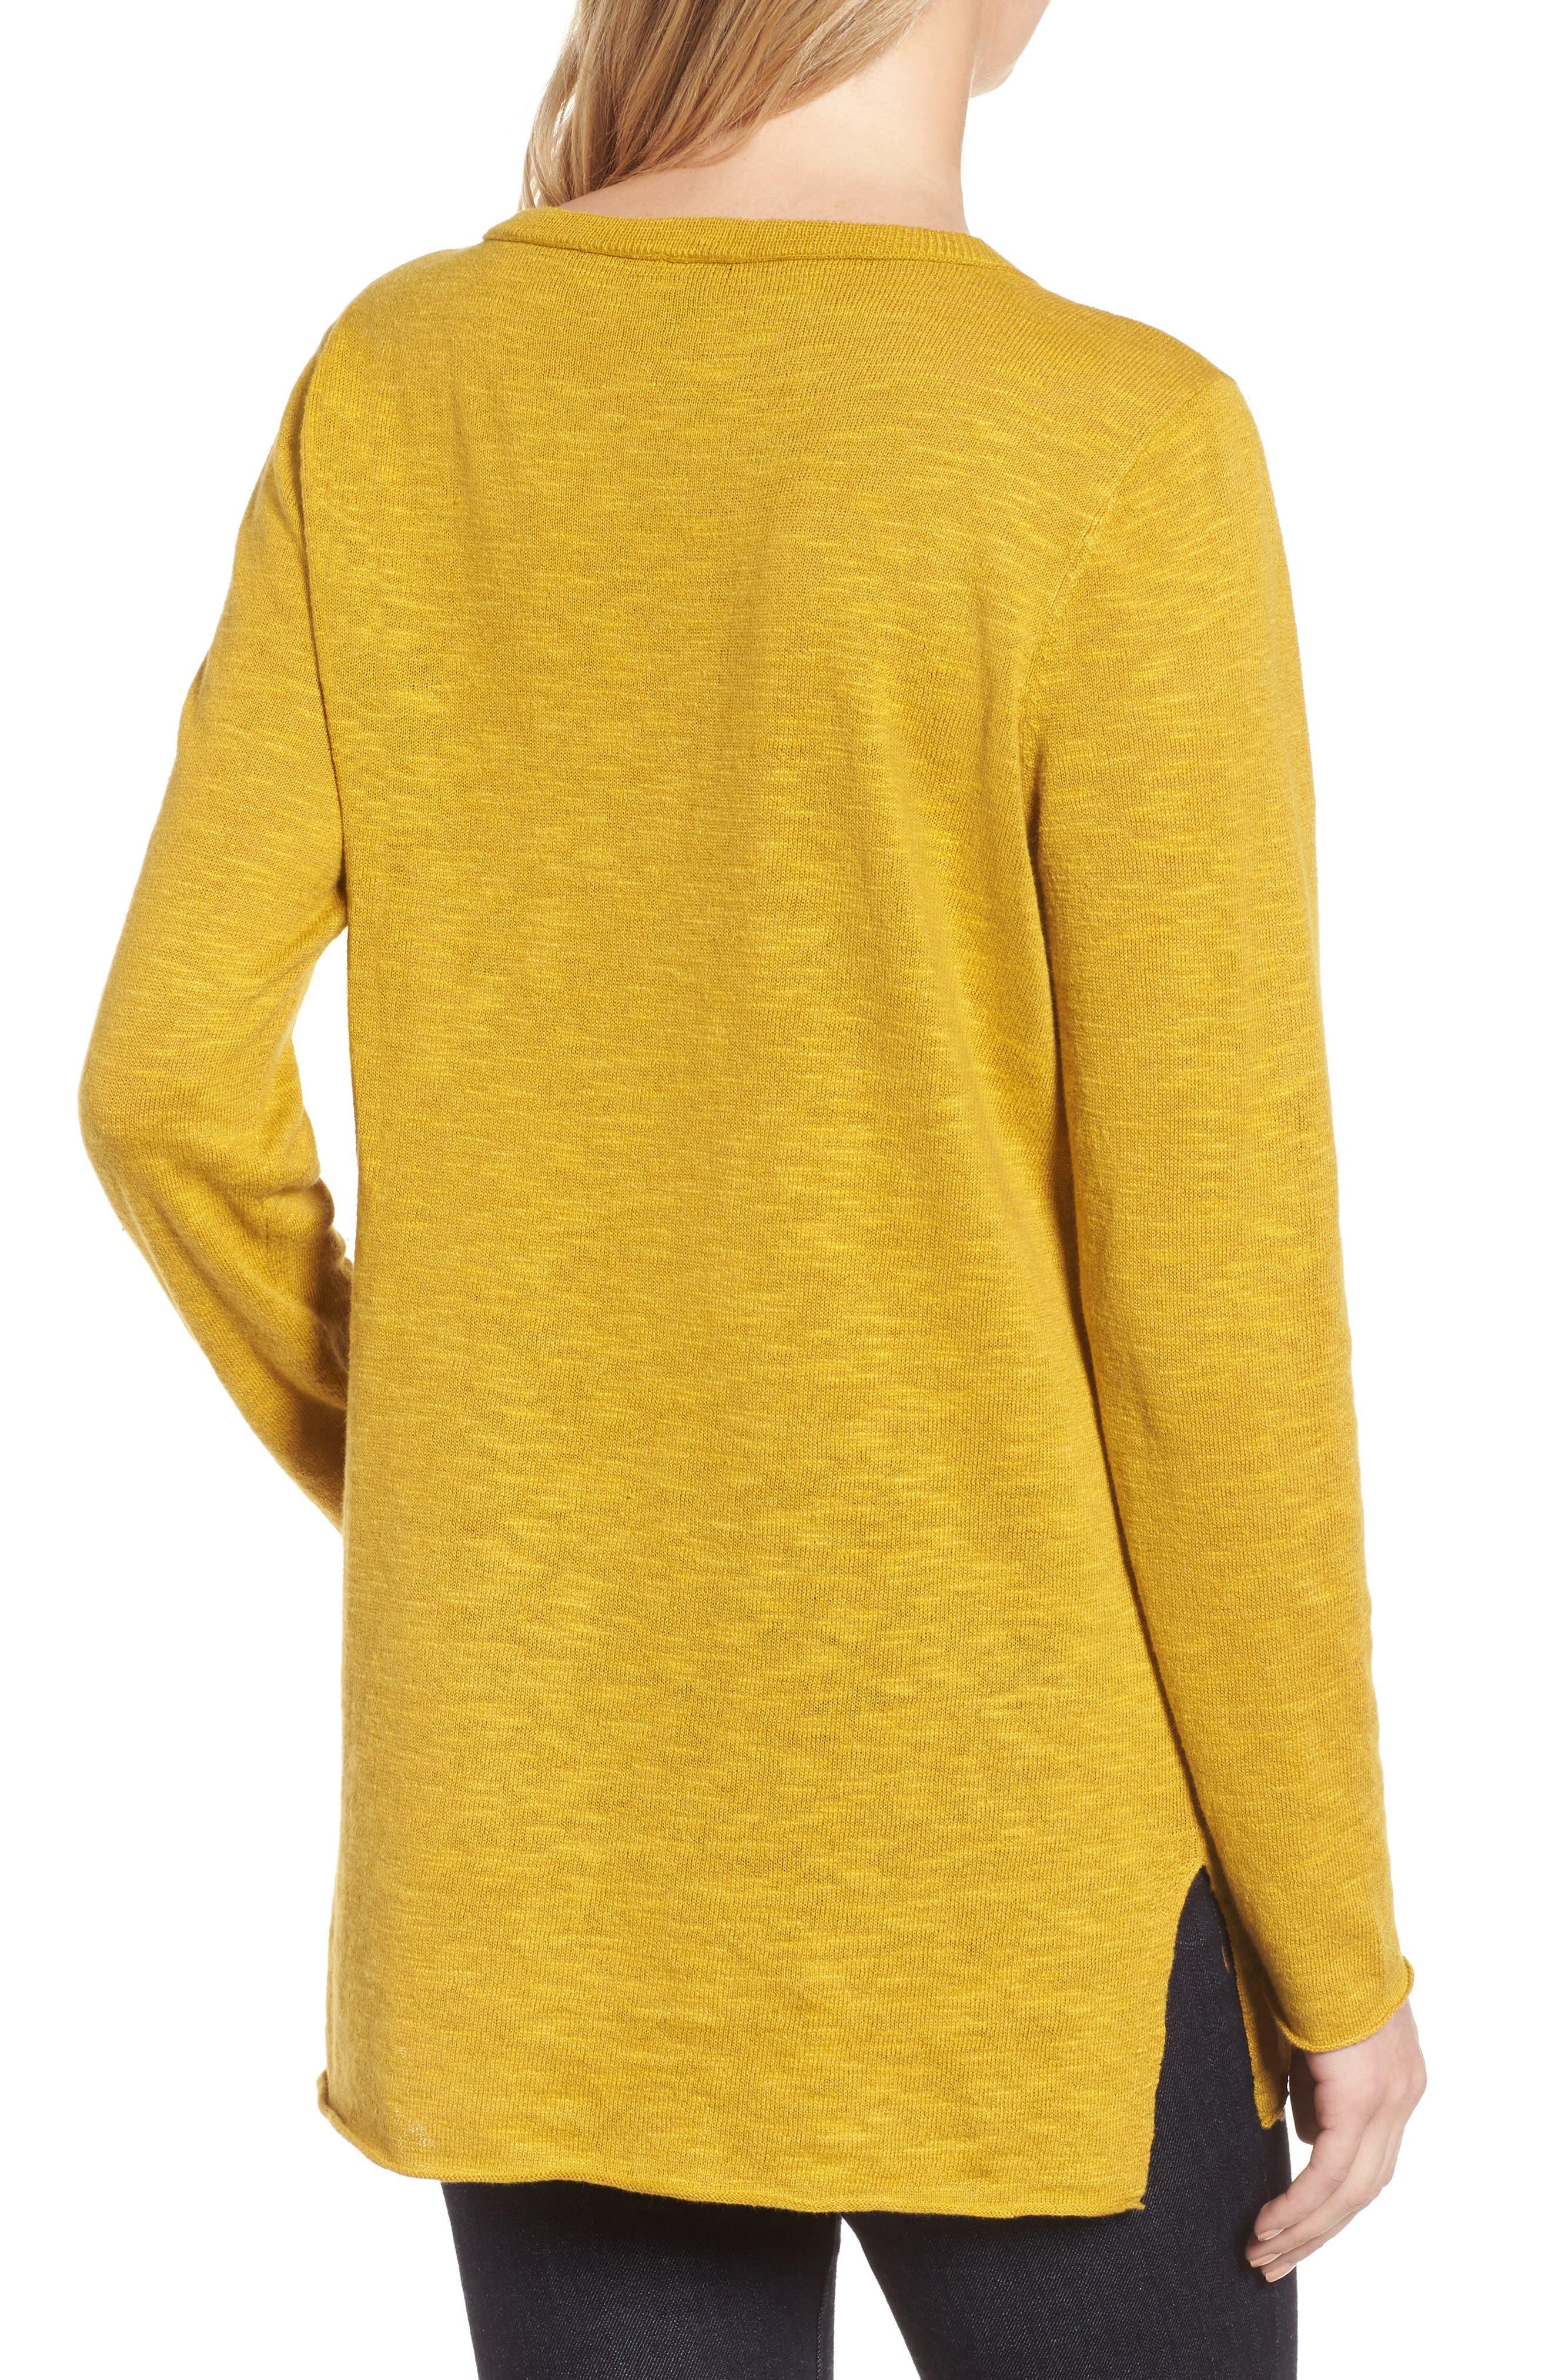 Organic Knit Crewneck Tunic Top,                             Alternate thumbnail 2, color,                             Mustard Seed